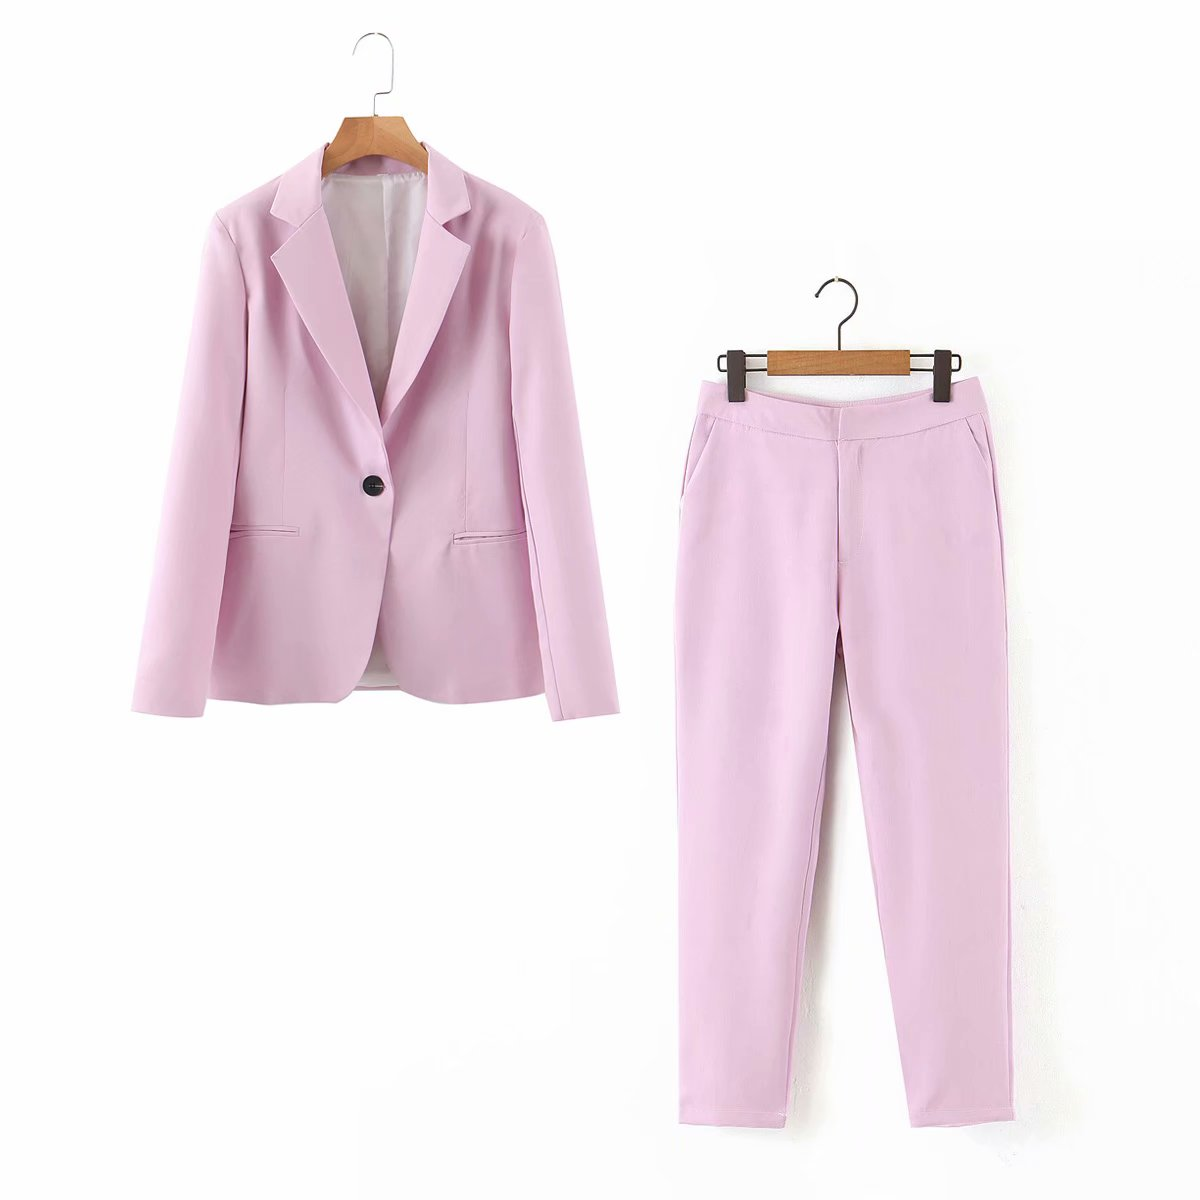 2021 Spring Autumn Purple Pink 2 Piece Set Women Single Button Office Lady Blazer Jacket Tops+Zipper Pants Suit Female Trousers